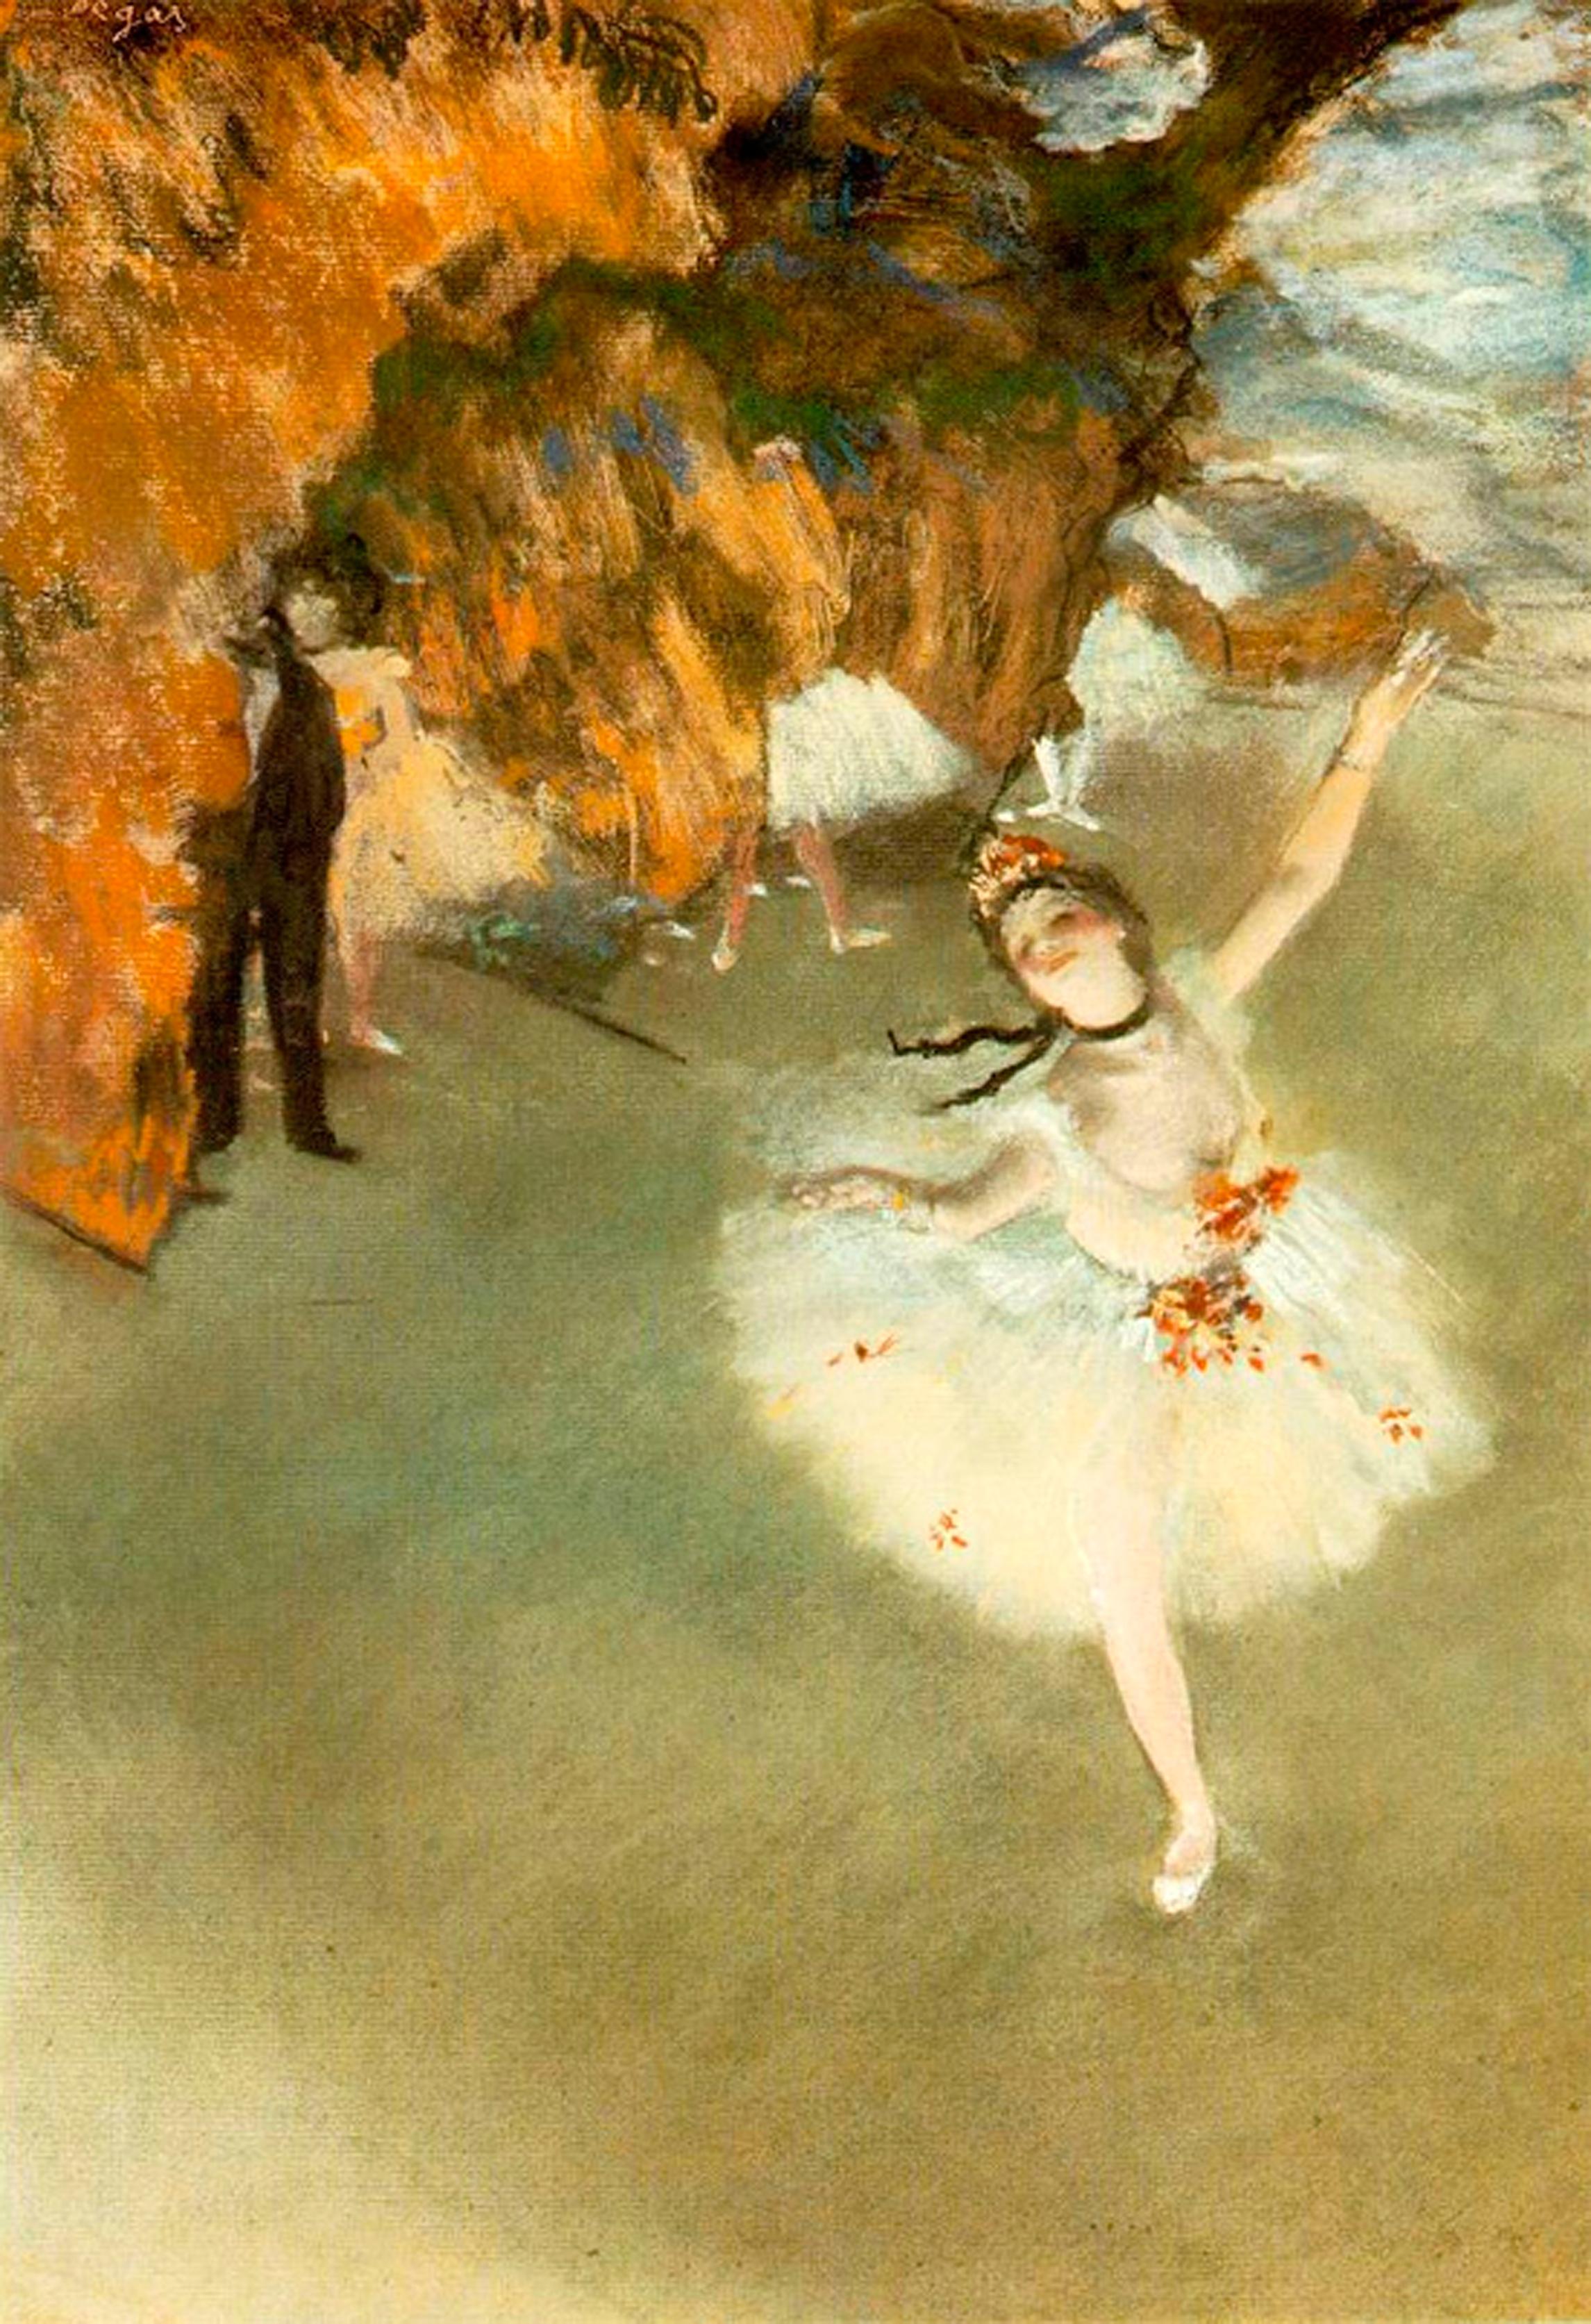 Звезда, Эдгар Дега - Дега Эдгар  ( Edgar Degas ) фото